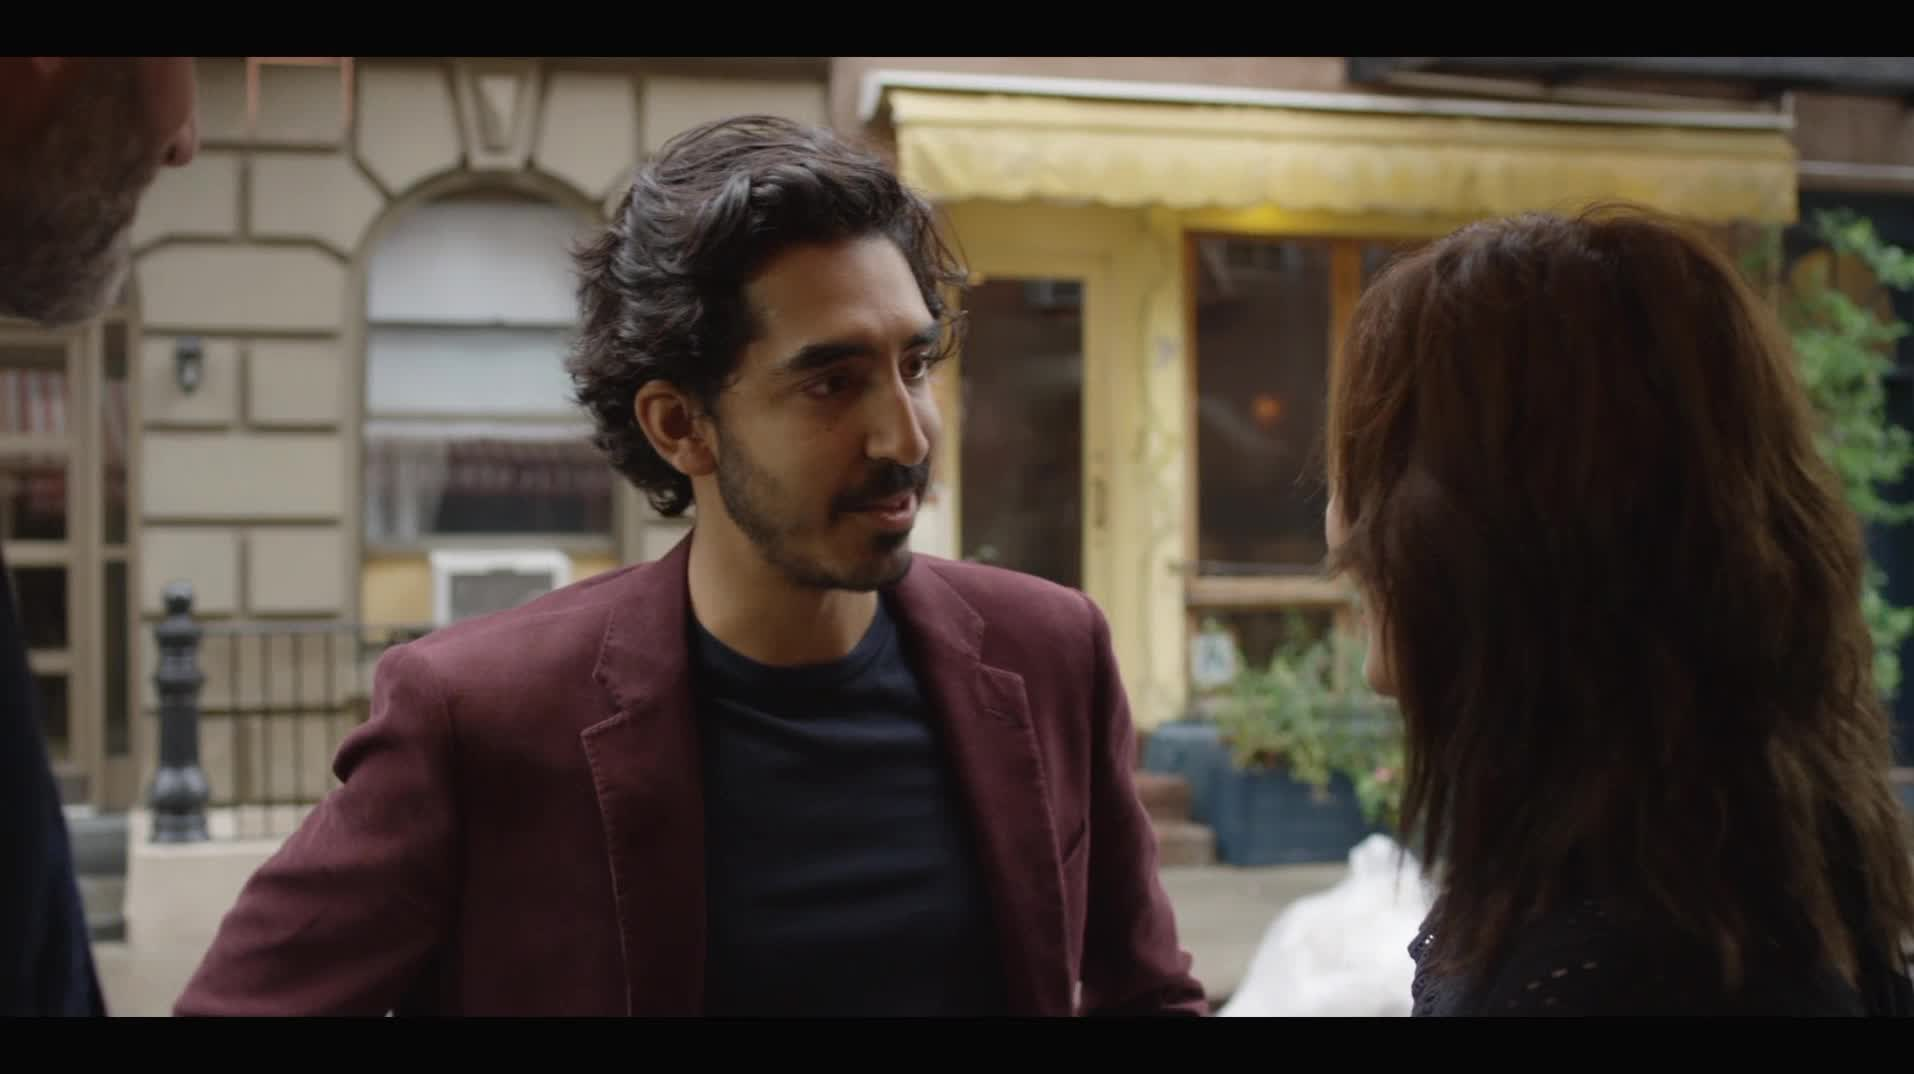 Modern Love - 1x08 - 'The Race Grows Sweeter Near Its Final Lap' Clip